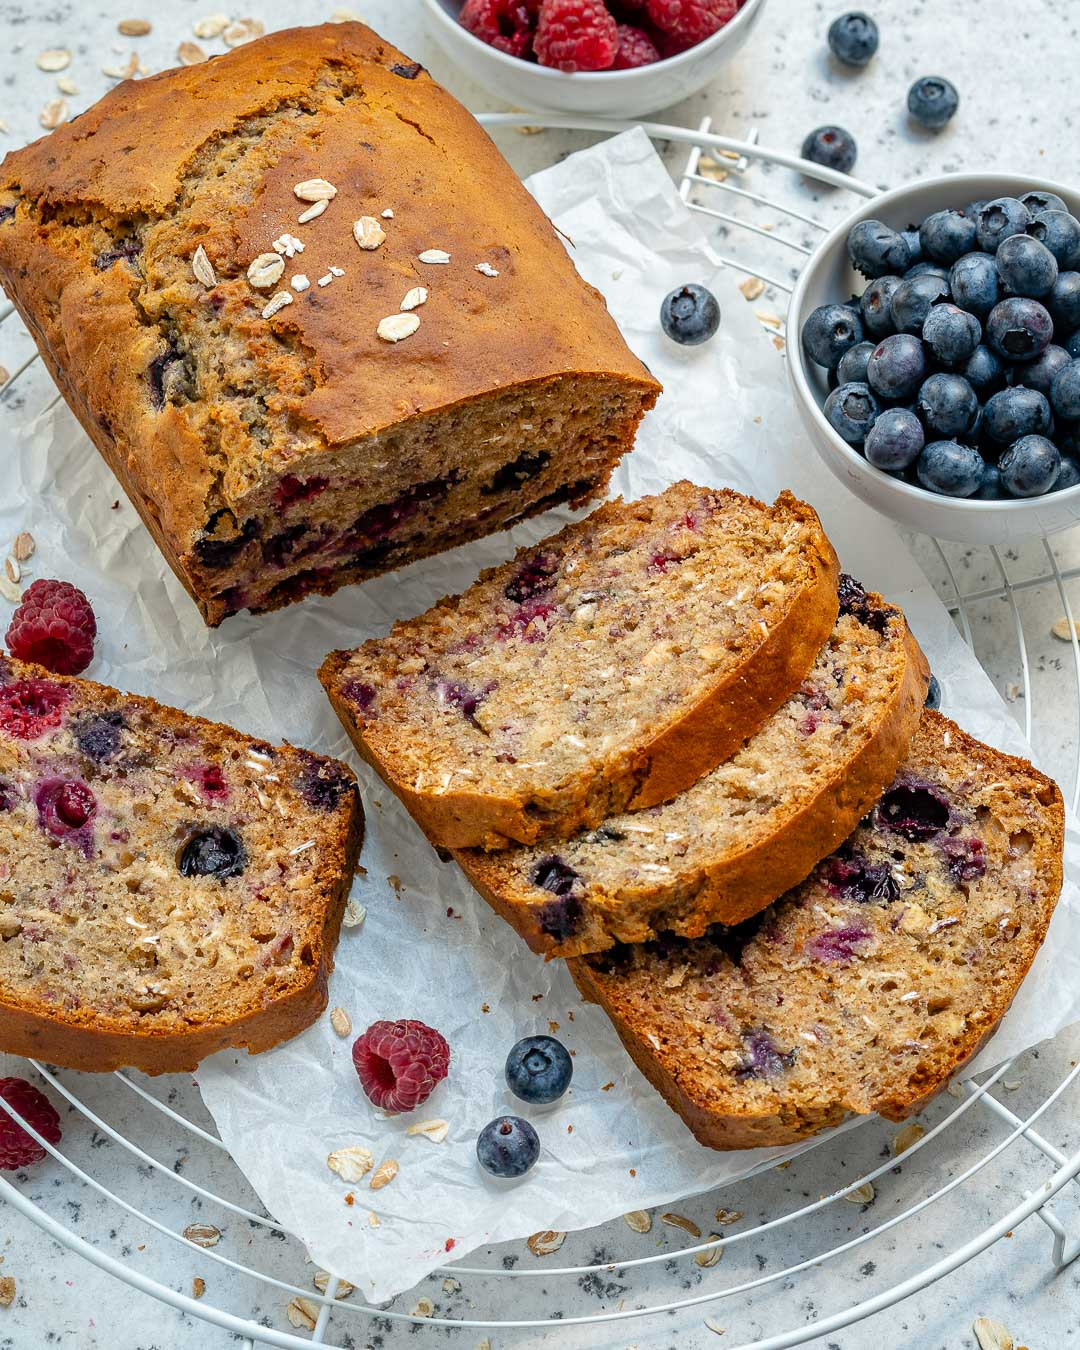 Healthy Blueberry Bread Recipes  Healthy Blueberry Oatmeal Bread Recipe